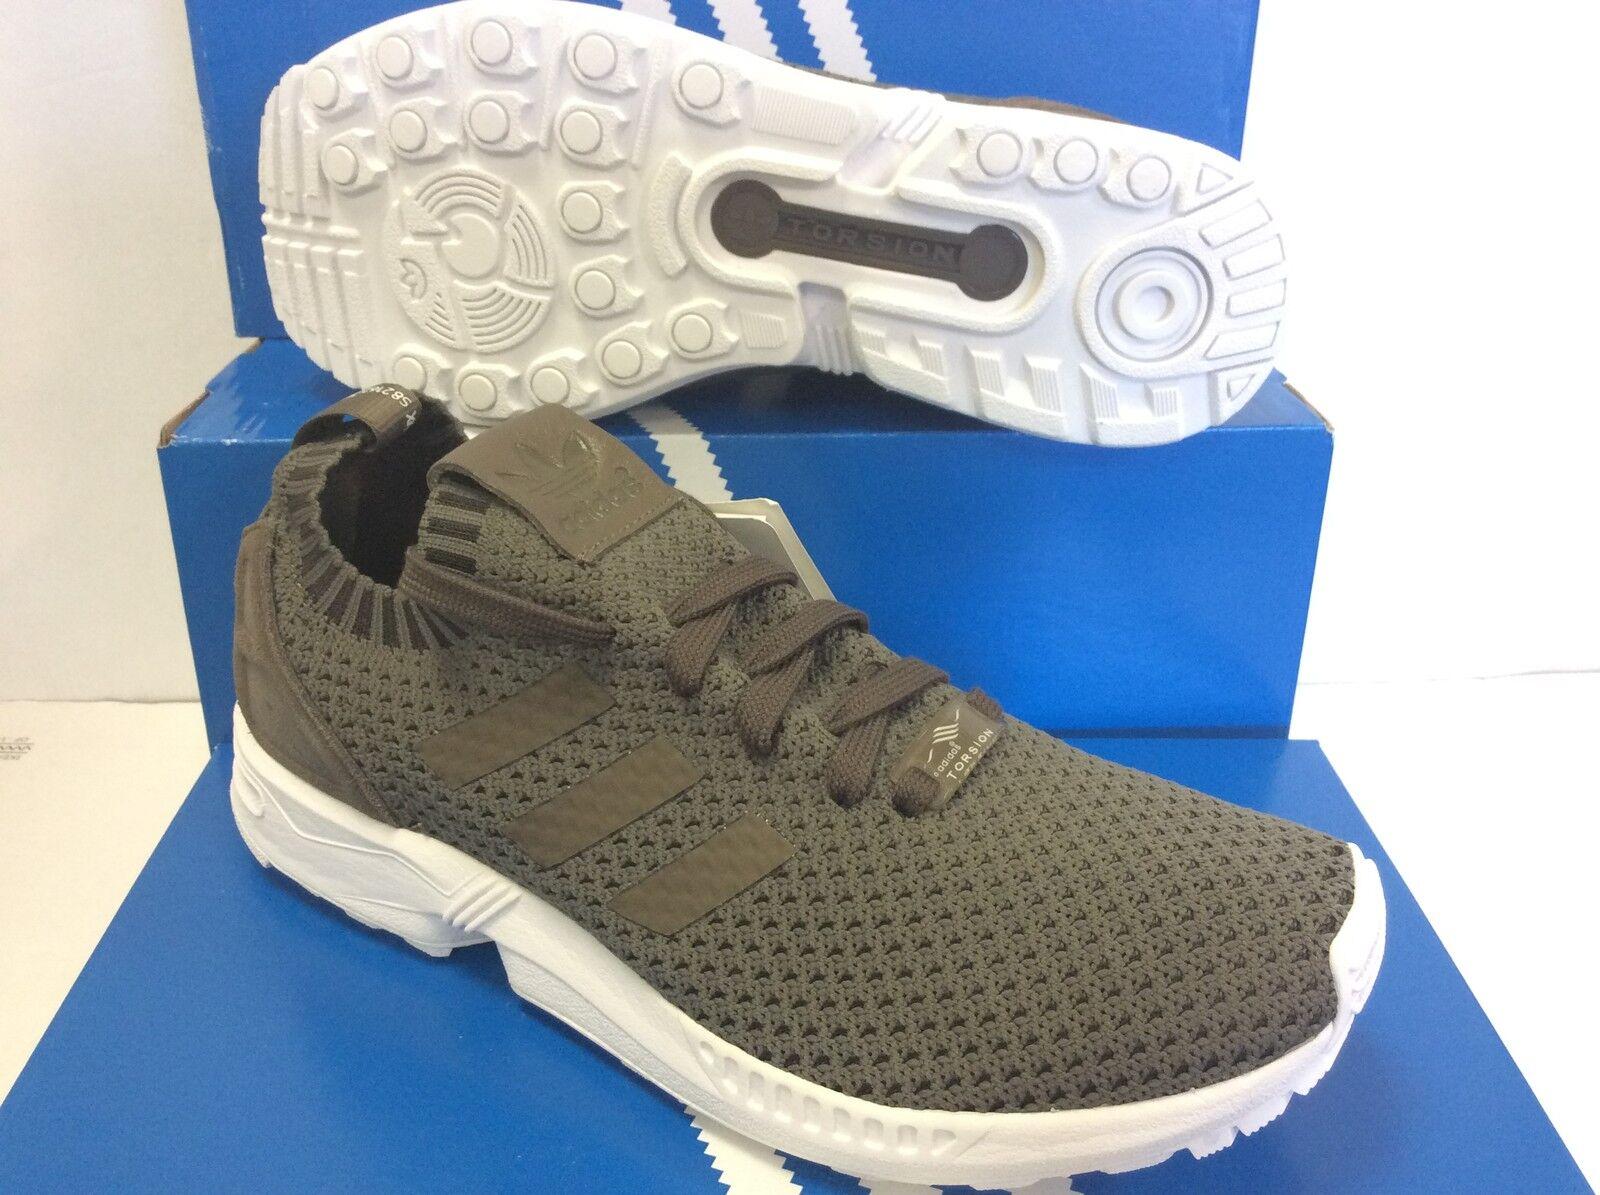 Adidas Originals ZX Flux PK Torsión S82162 Hombre Zapatillas, Talla UK 7.5 EU 41